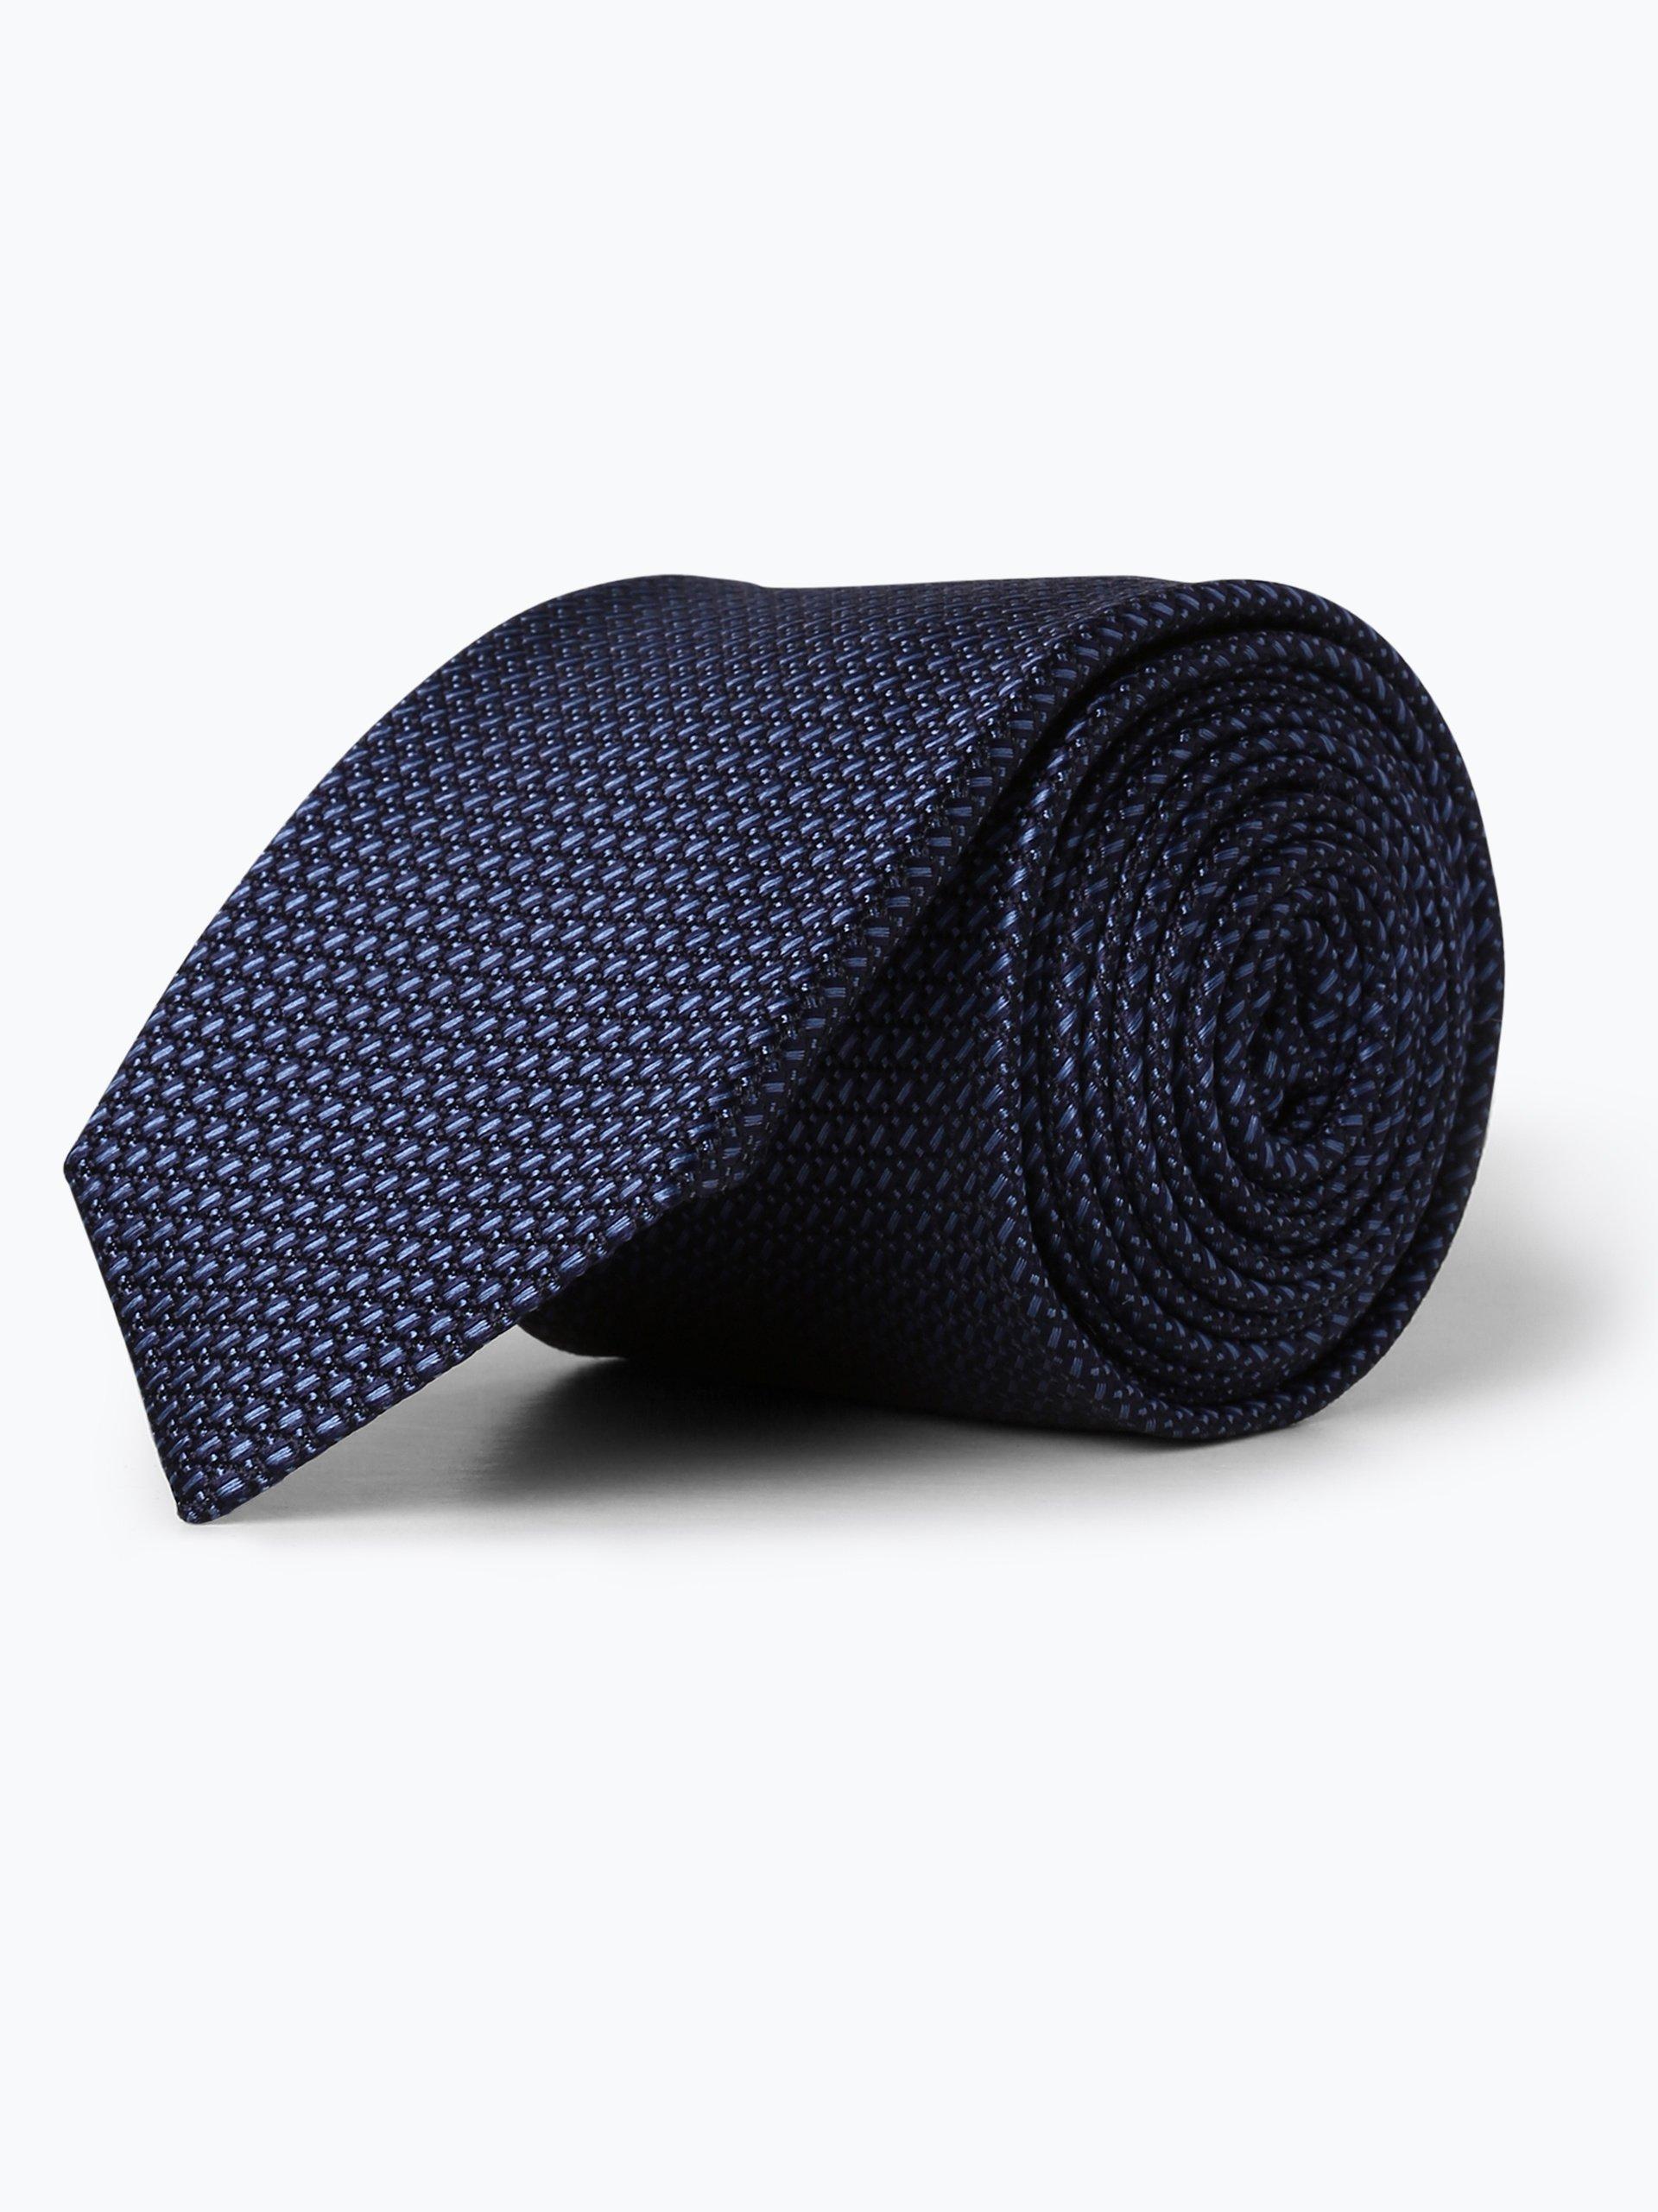 OLYMP Luxor modern fit Herren Krawatte aus Seide